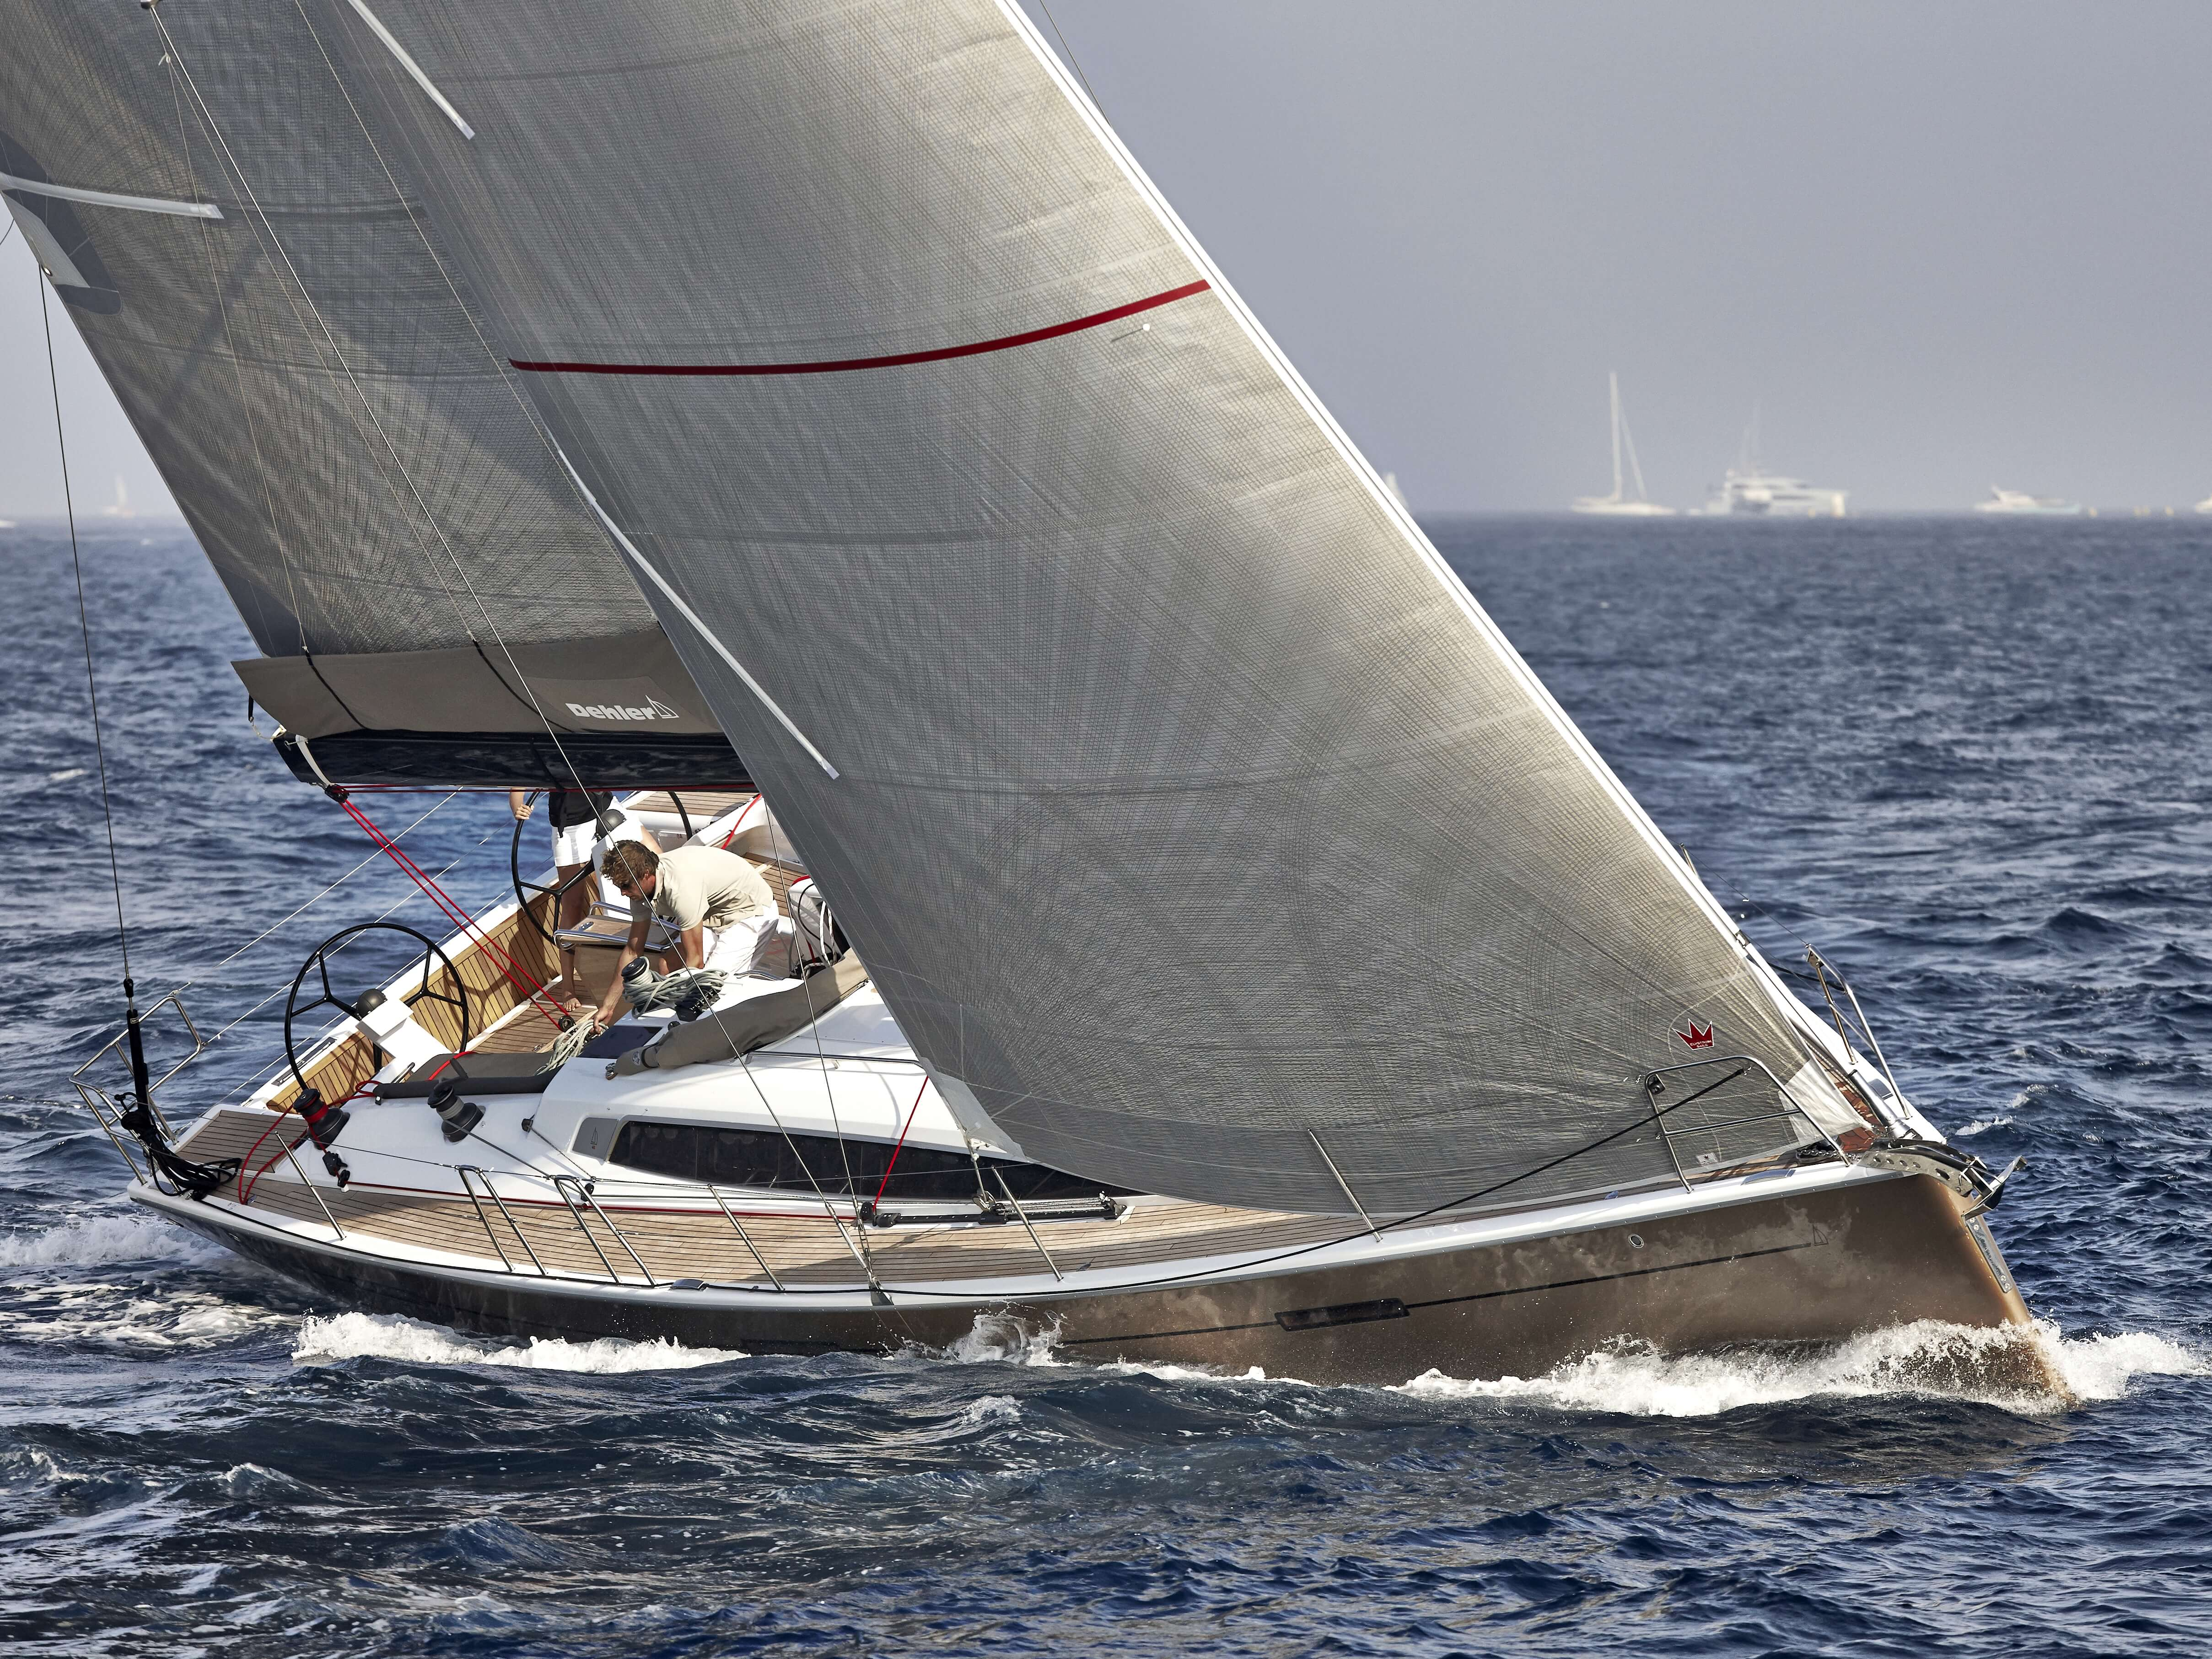 Dehler 46 Exterior Sailing | forsesail, mainsail, bow | Dehler